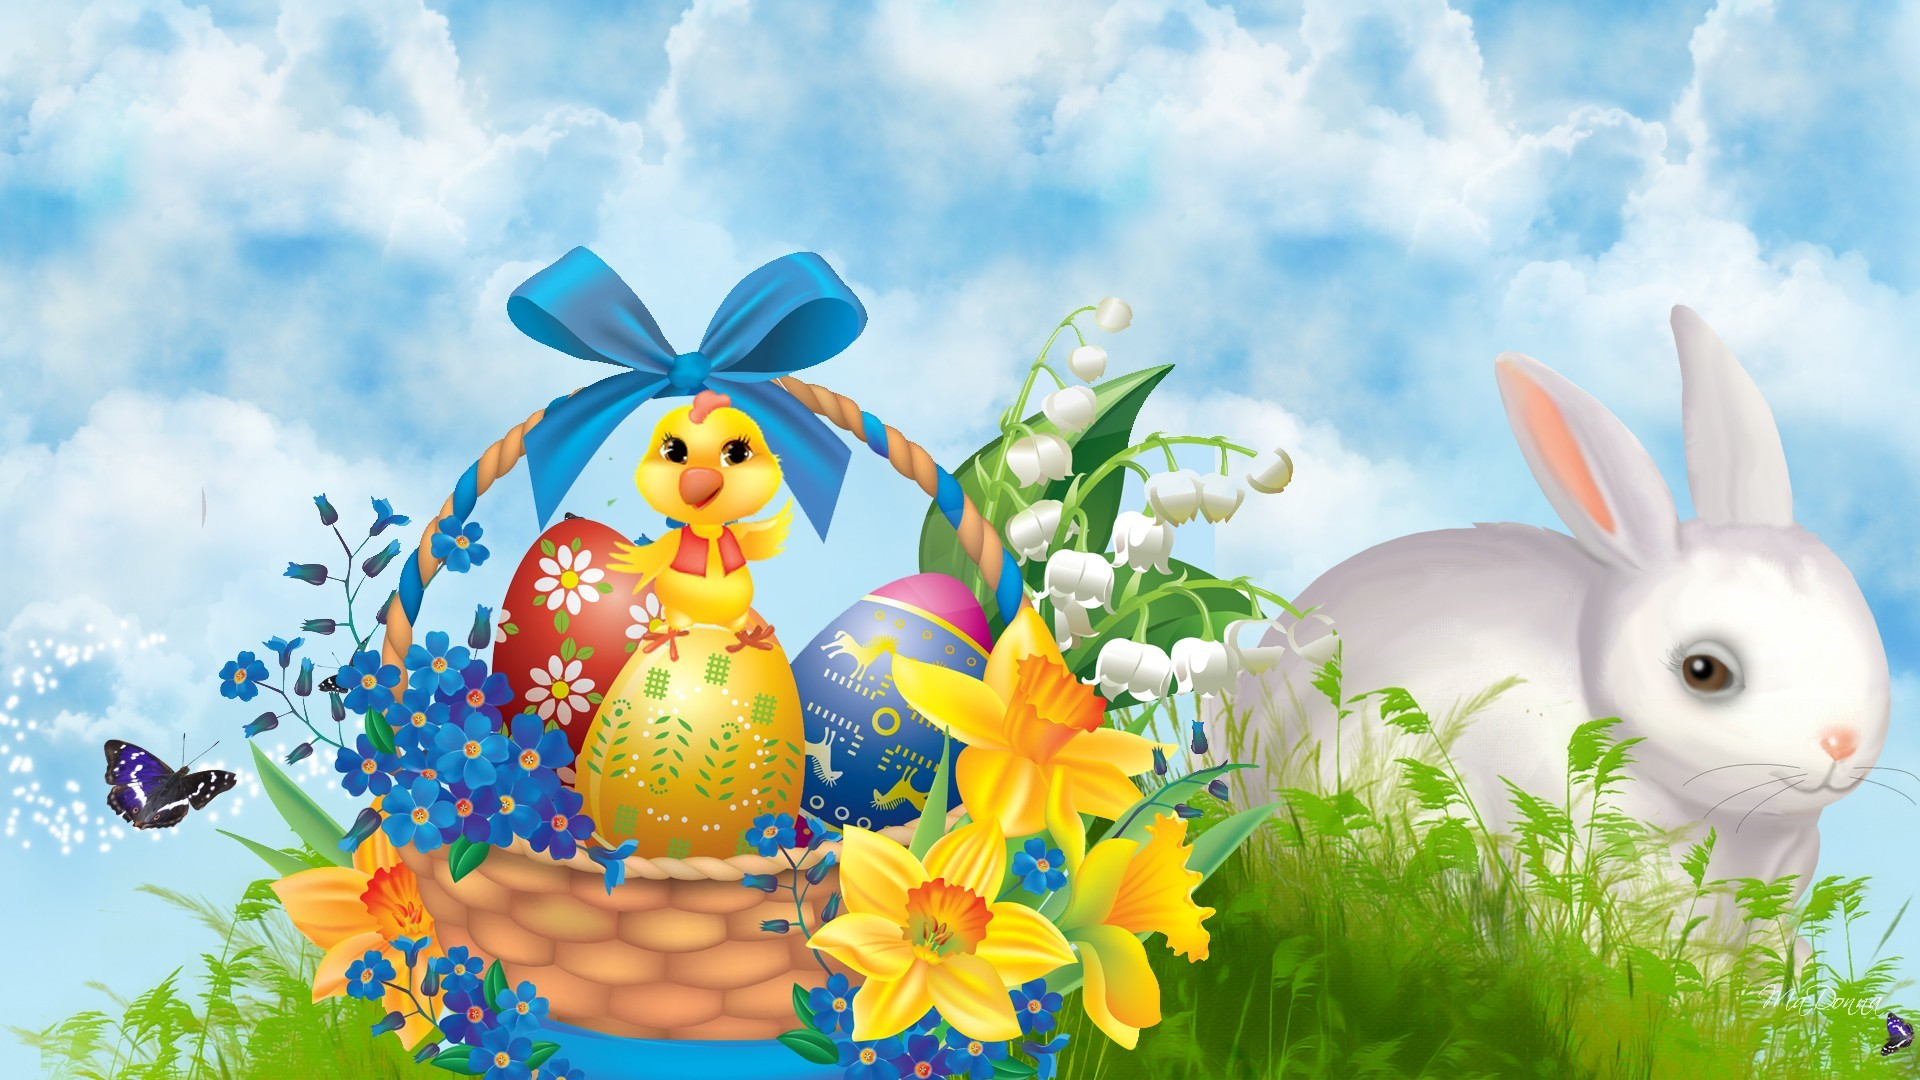 HD Bunnies And Easter Wallpapers Desktop Backgrounds | Funmole